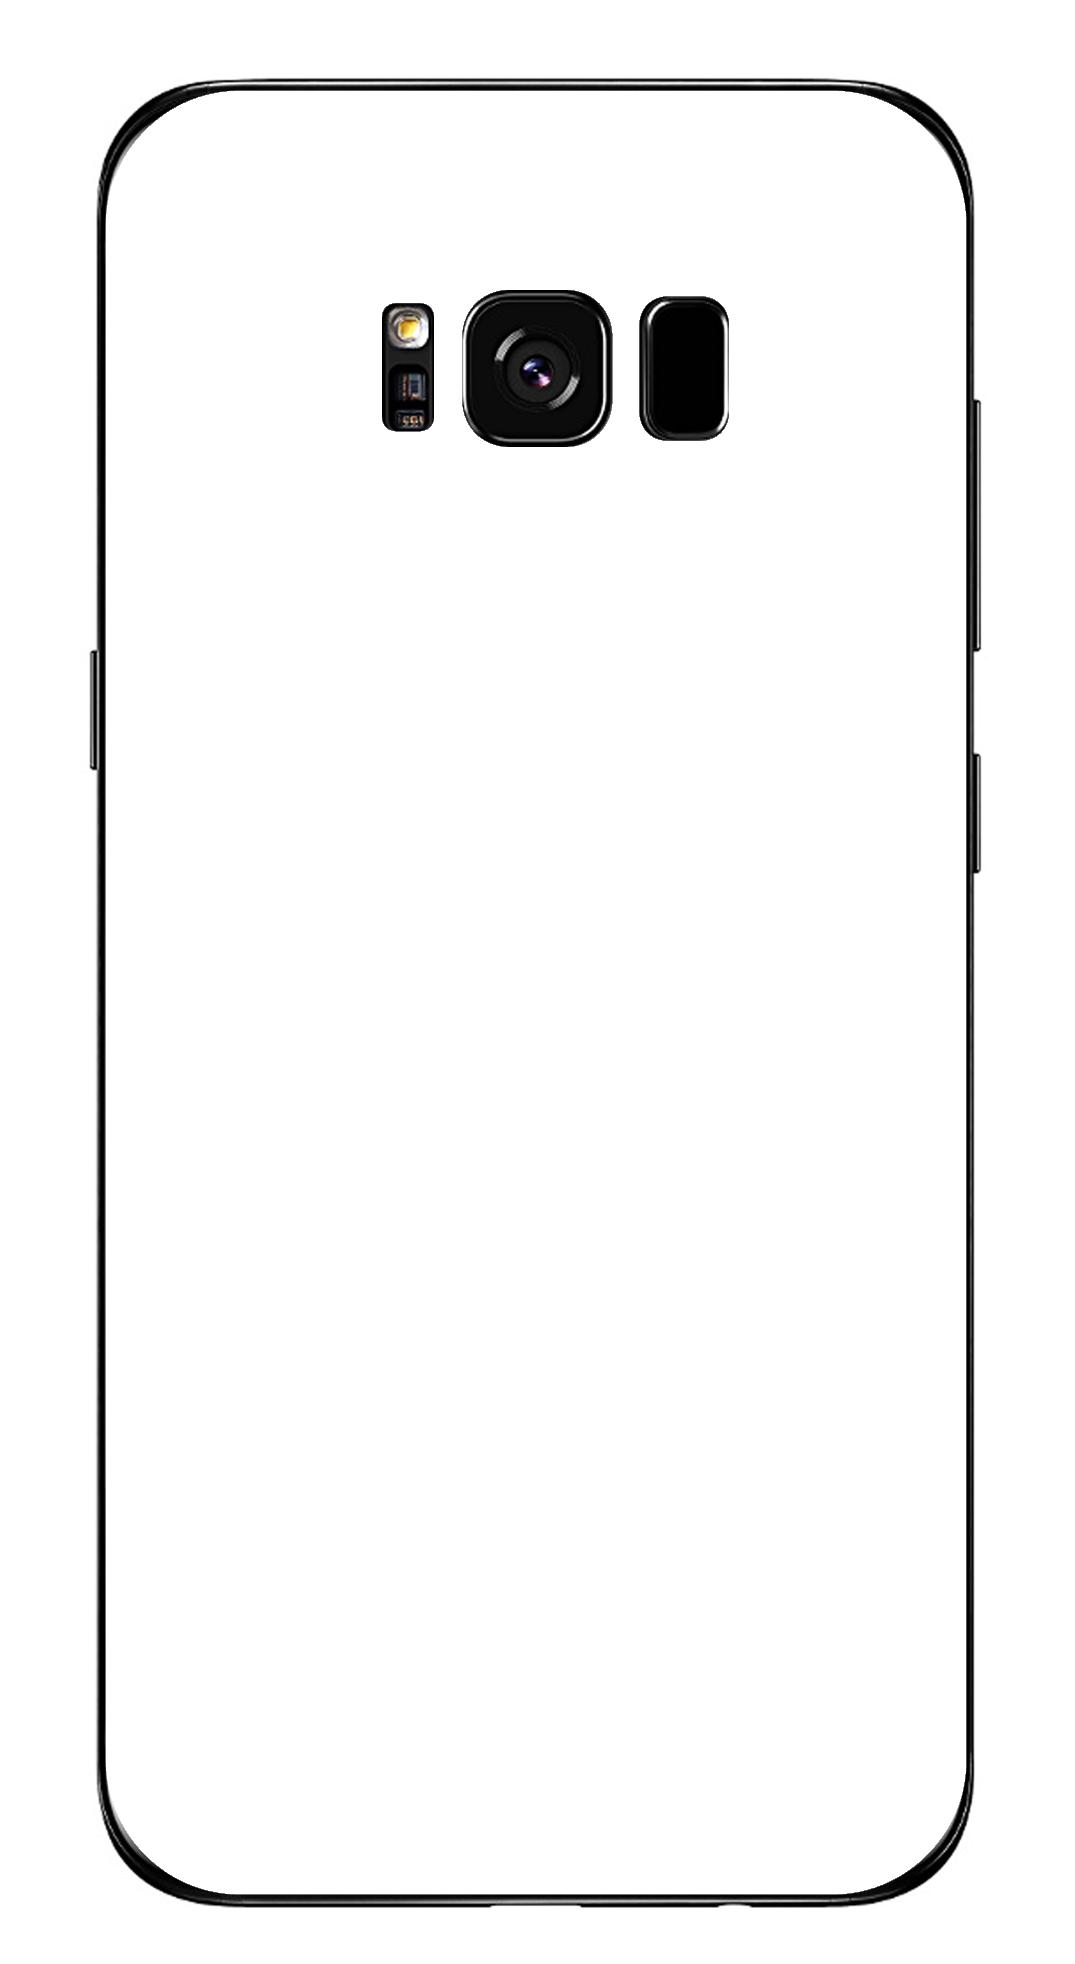 Galaxy S8 Plus Skin 10595